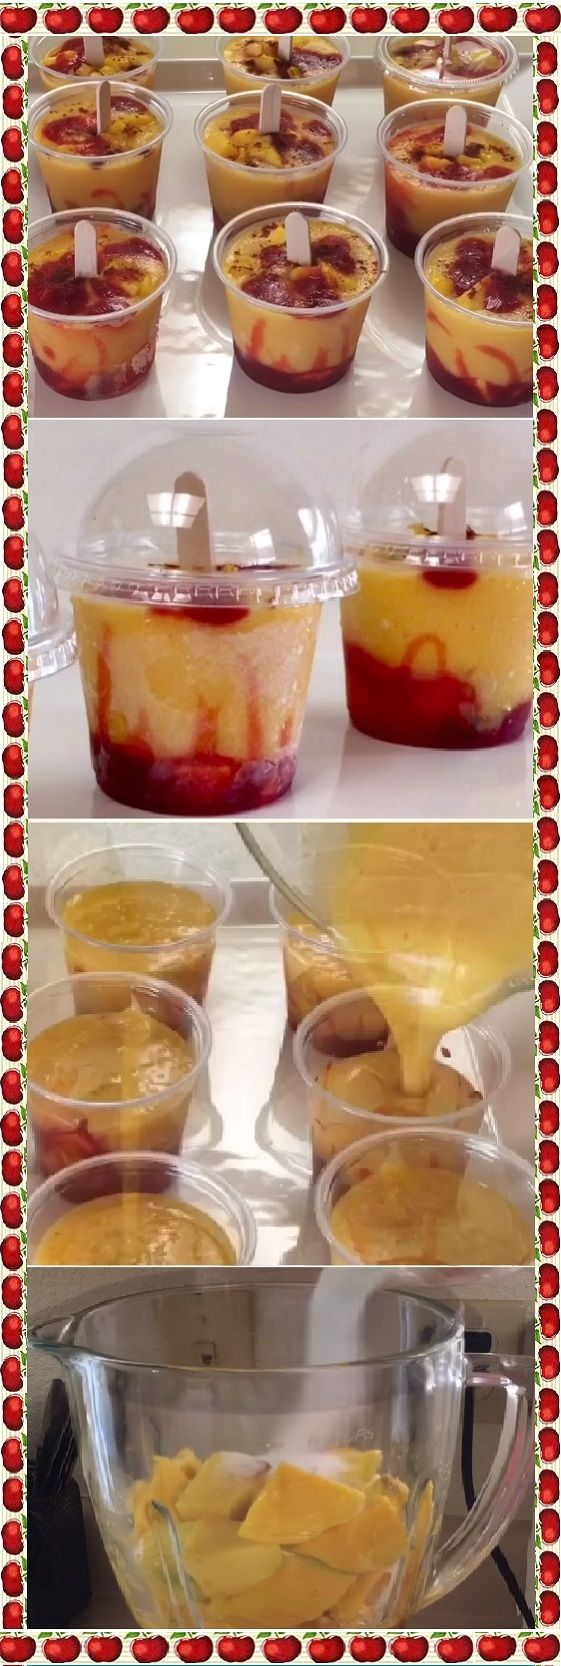 Mini Mangonadas Con Delicioso Y Natural Sabor A Fruta Recetas Faciles Para Cocinar Receta De Postres Frios Postres Fríos